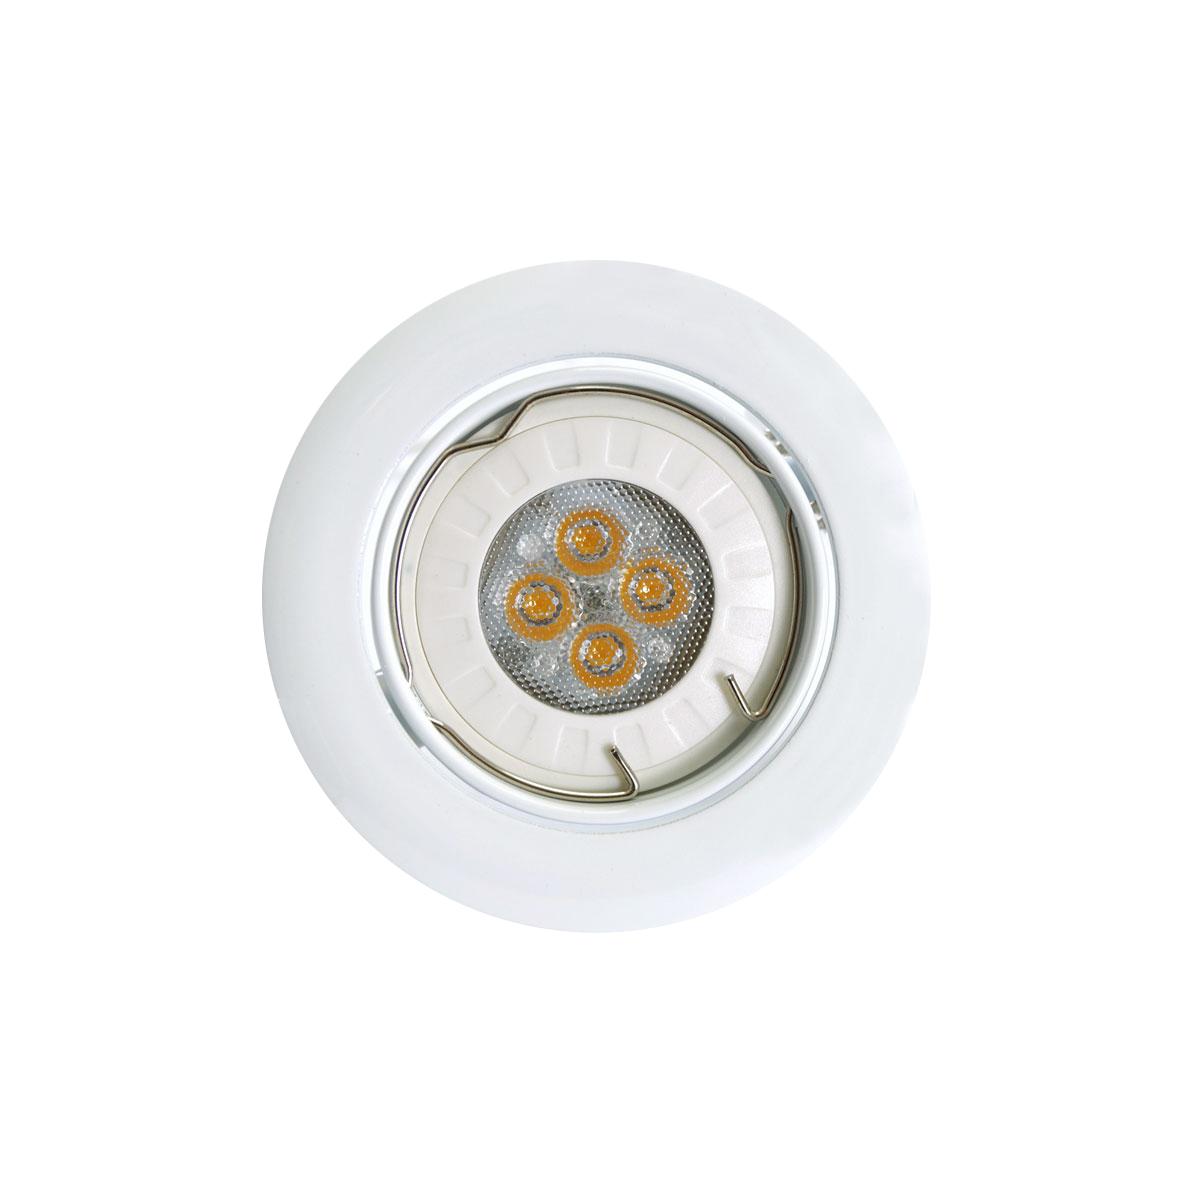 Basculante aluminio 50 mm luminaria empotrable secom - Sistemas de iluminacion interior ...